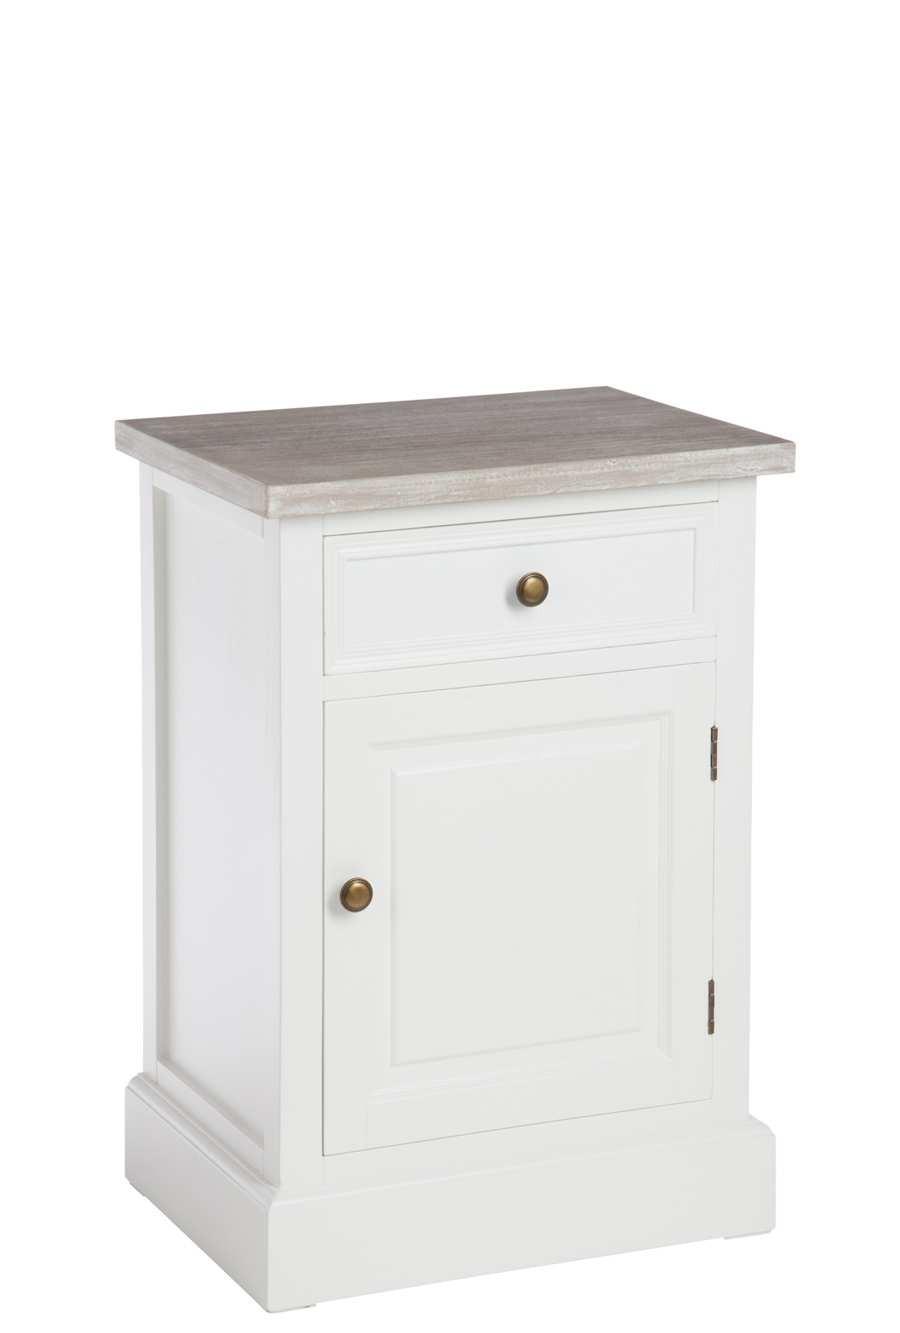 table de nuit bois blanc fashion designs. Black Bedroom Furniture Sets. Home Design Ideas